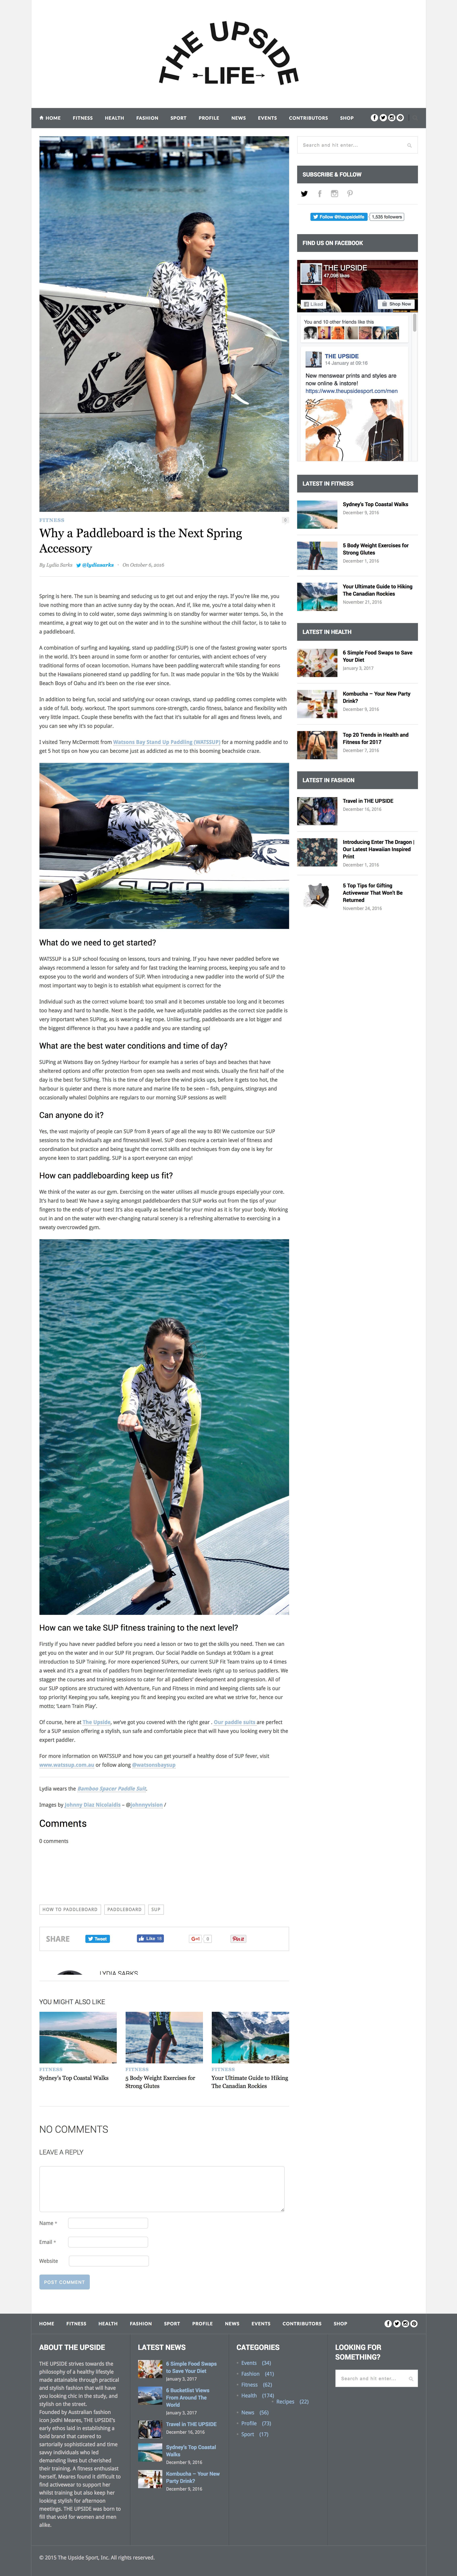 screencapture-blog-theupsidesport-paddleboard-next-spring-accessory-1484604408926 copy.jpg